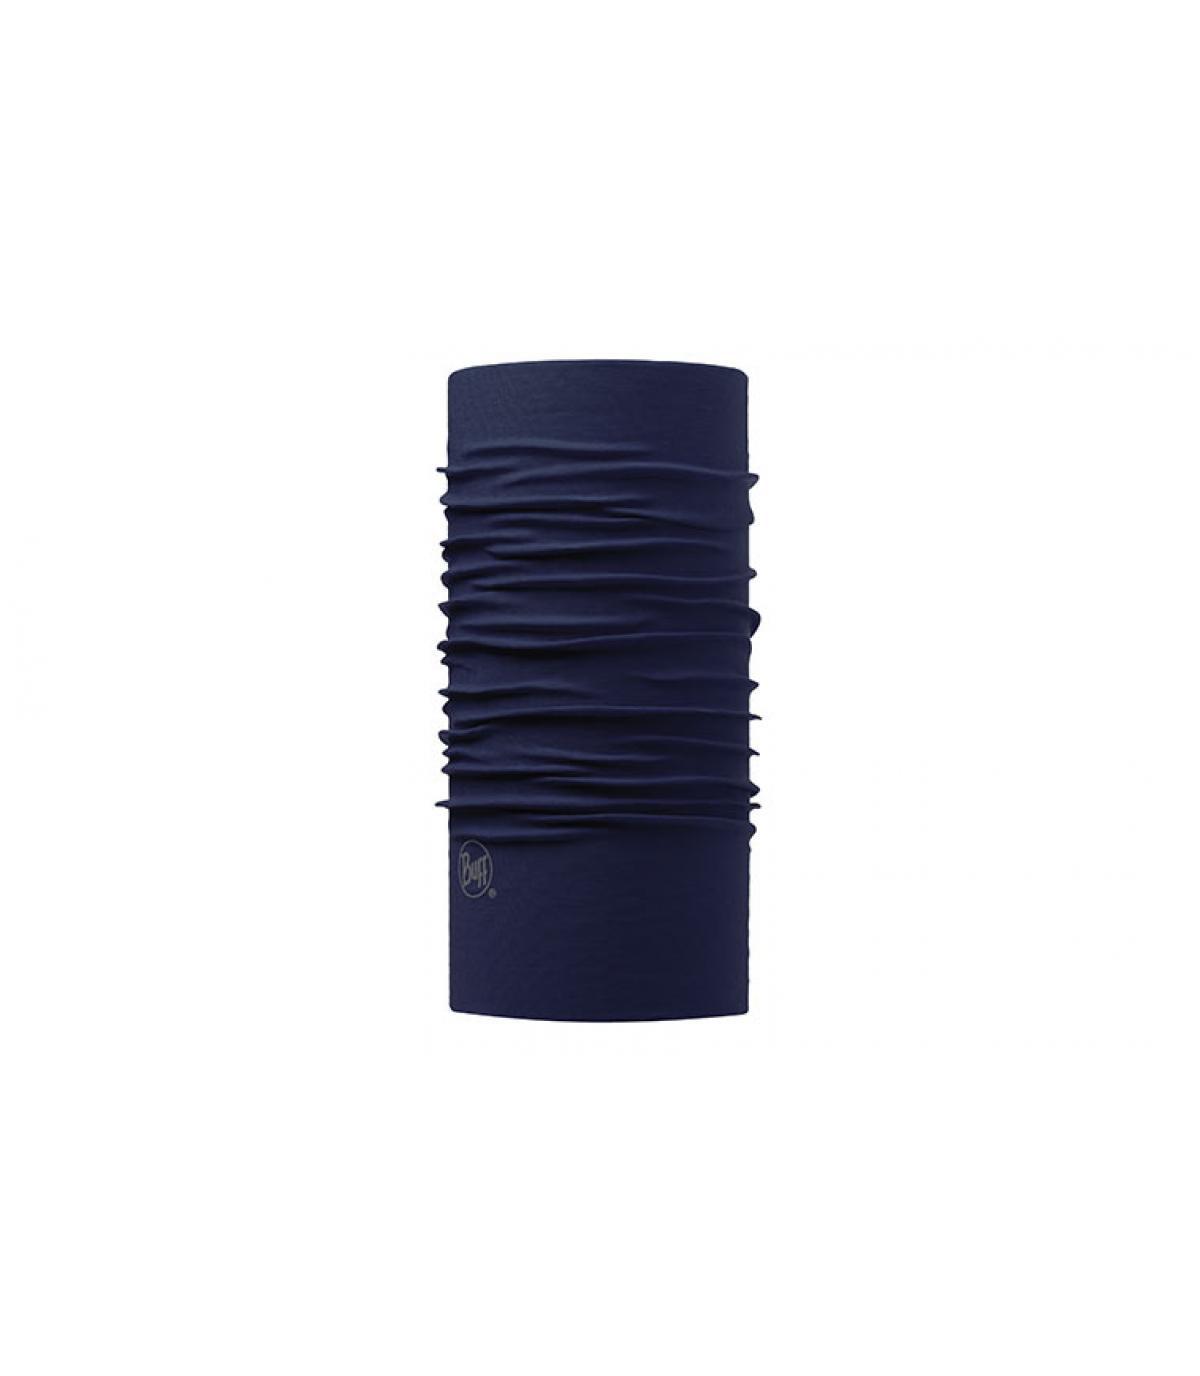 Schlauchtuch Buff marineblau